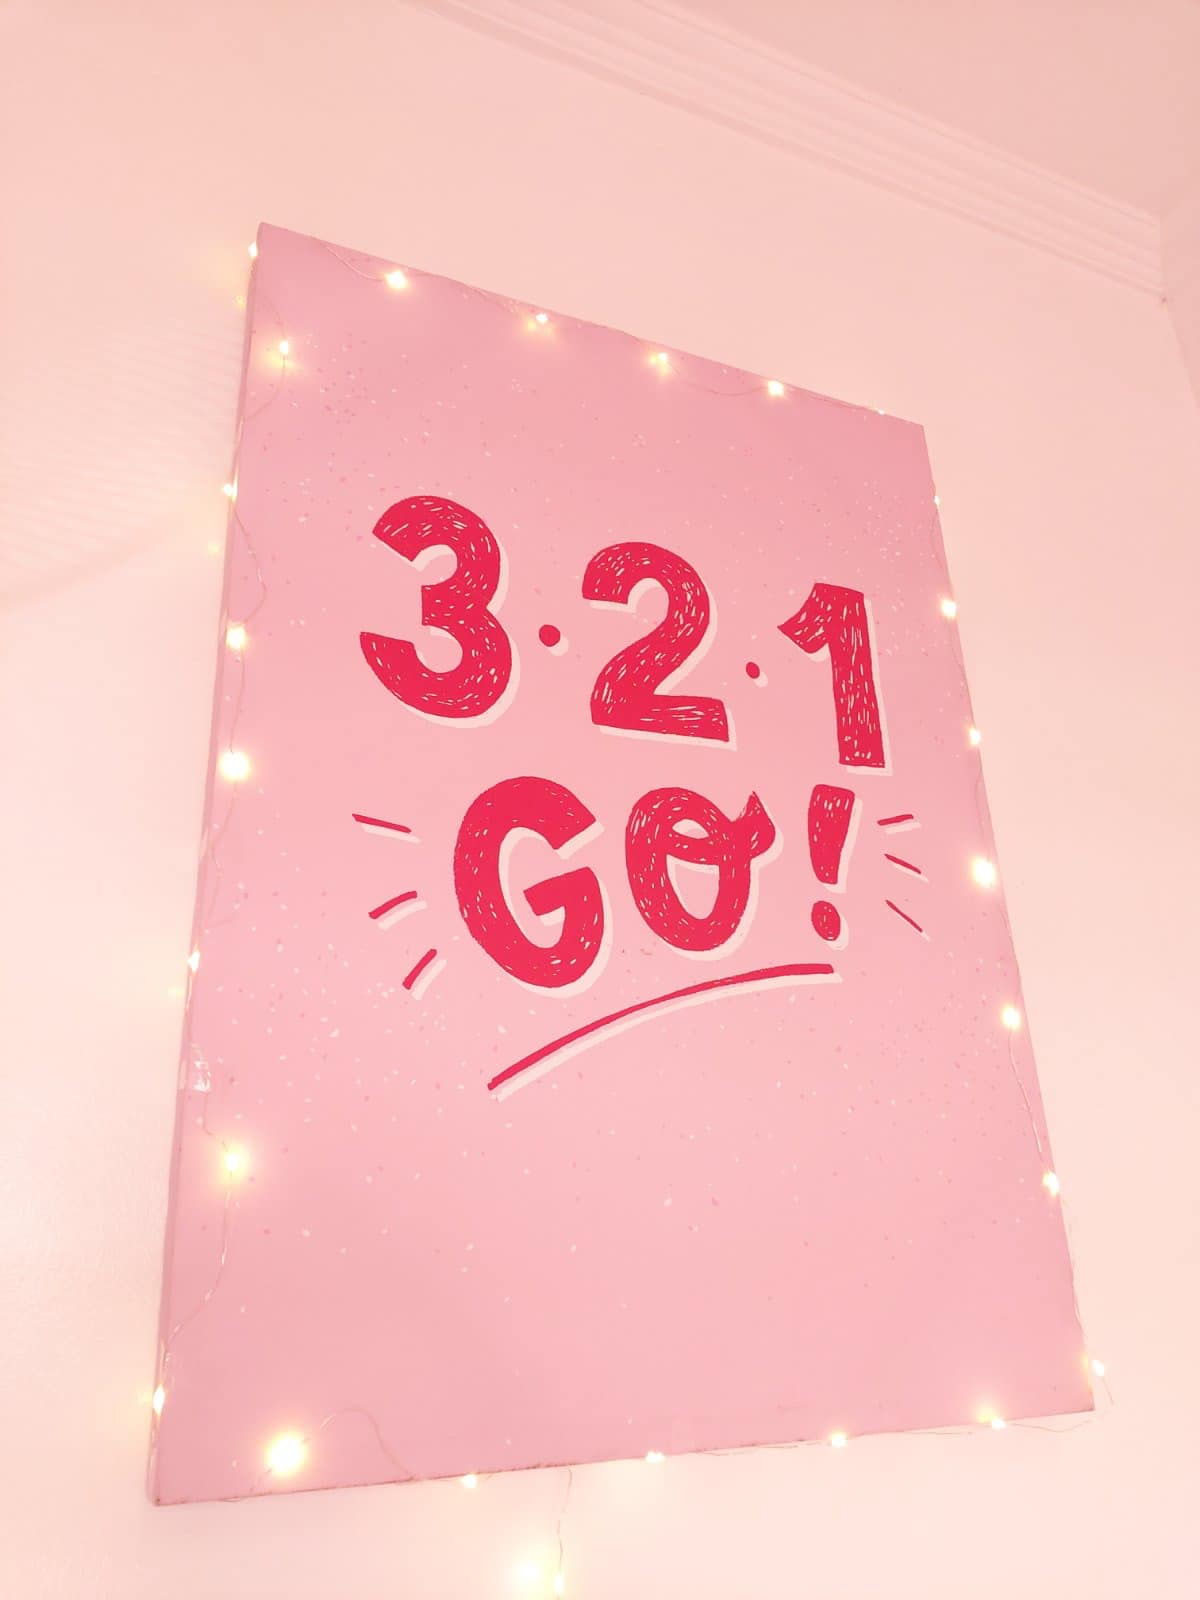 all-pink bedroom - wall art